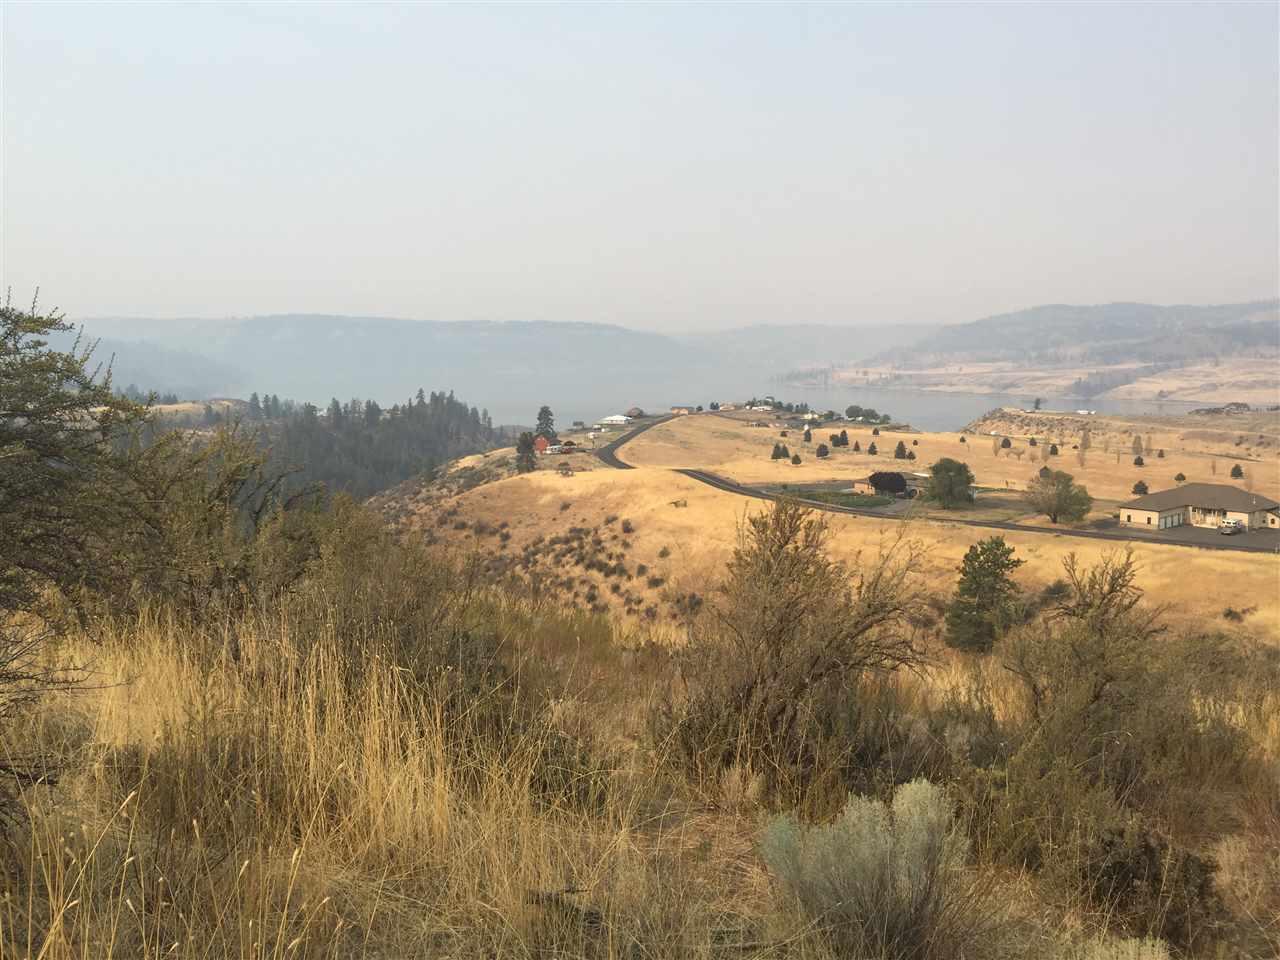 N Miles Creston Rd, Deer Meadow, Washington 99122